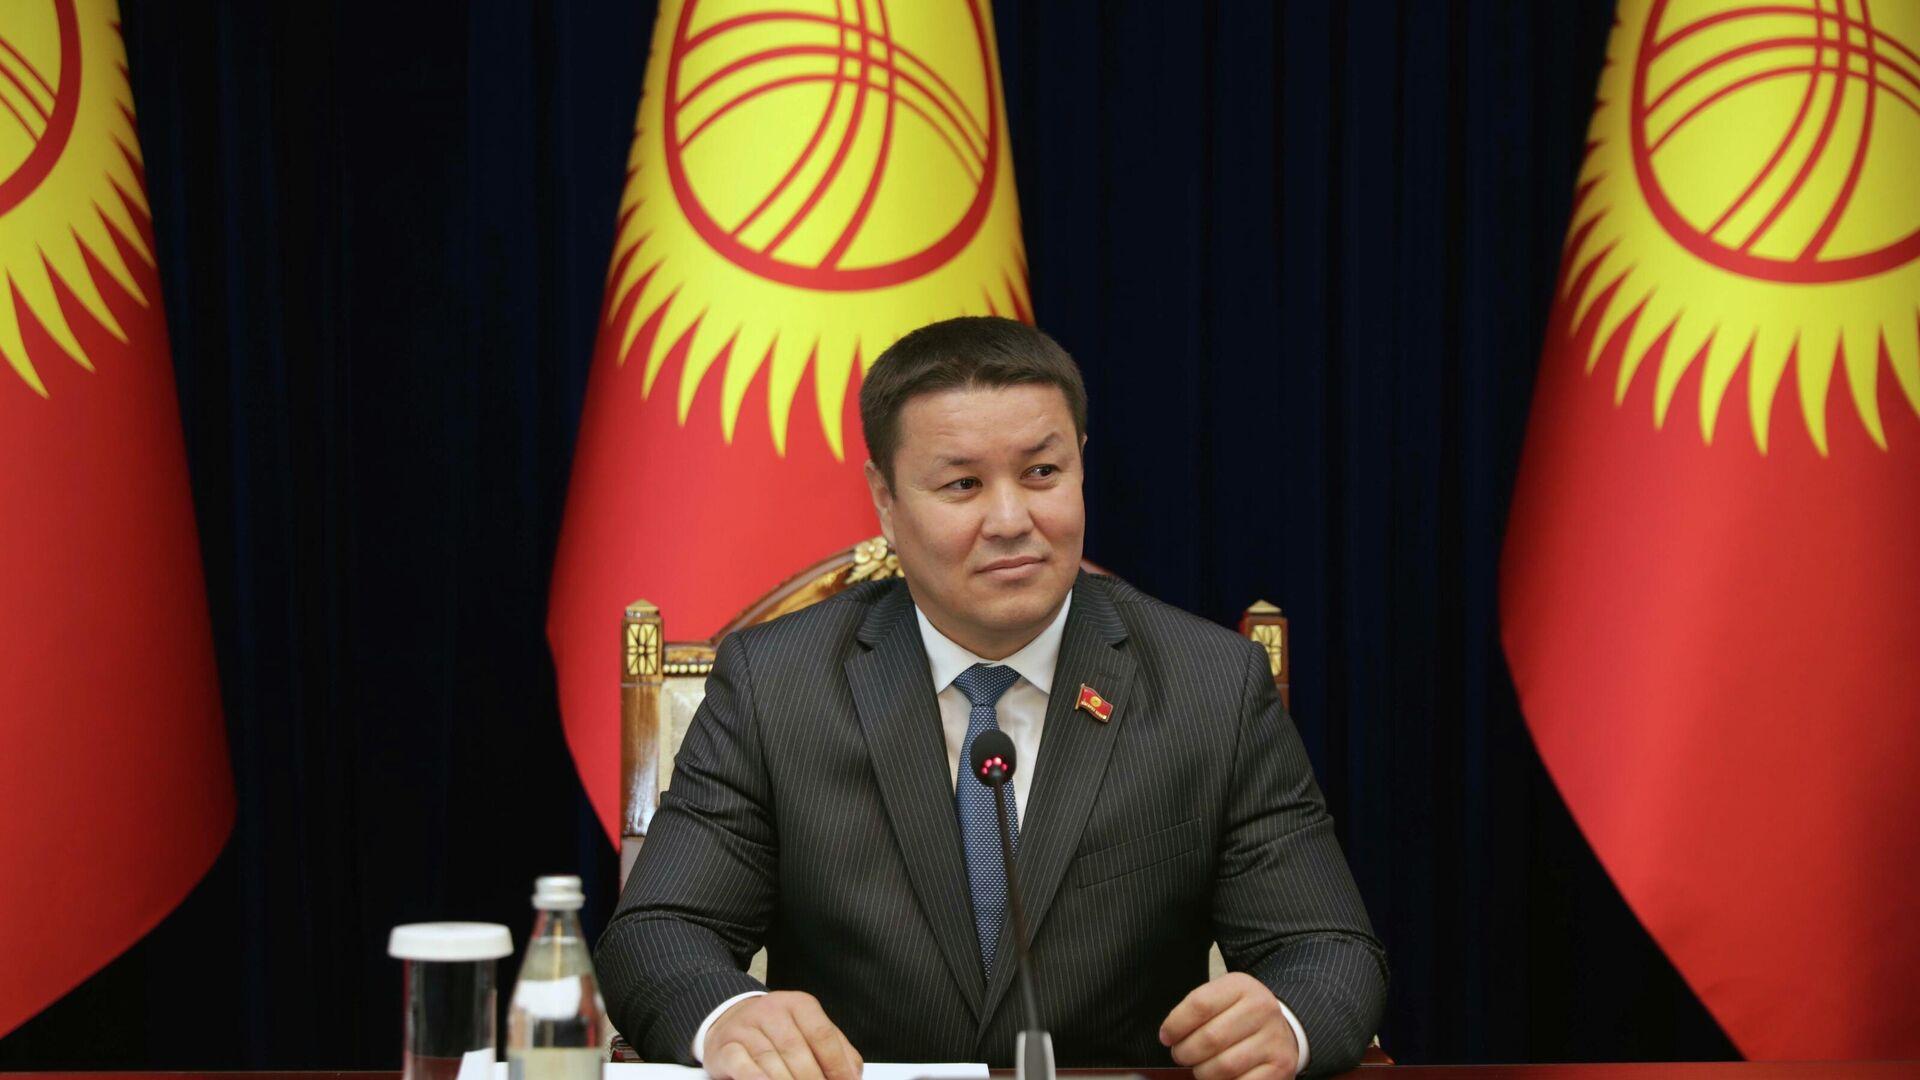 И.о. президента Киргизии Талант Мамытов - РИА Новости, 1920, 27.11.2020